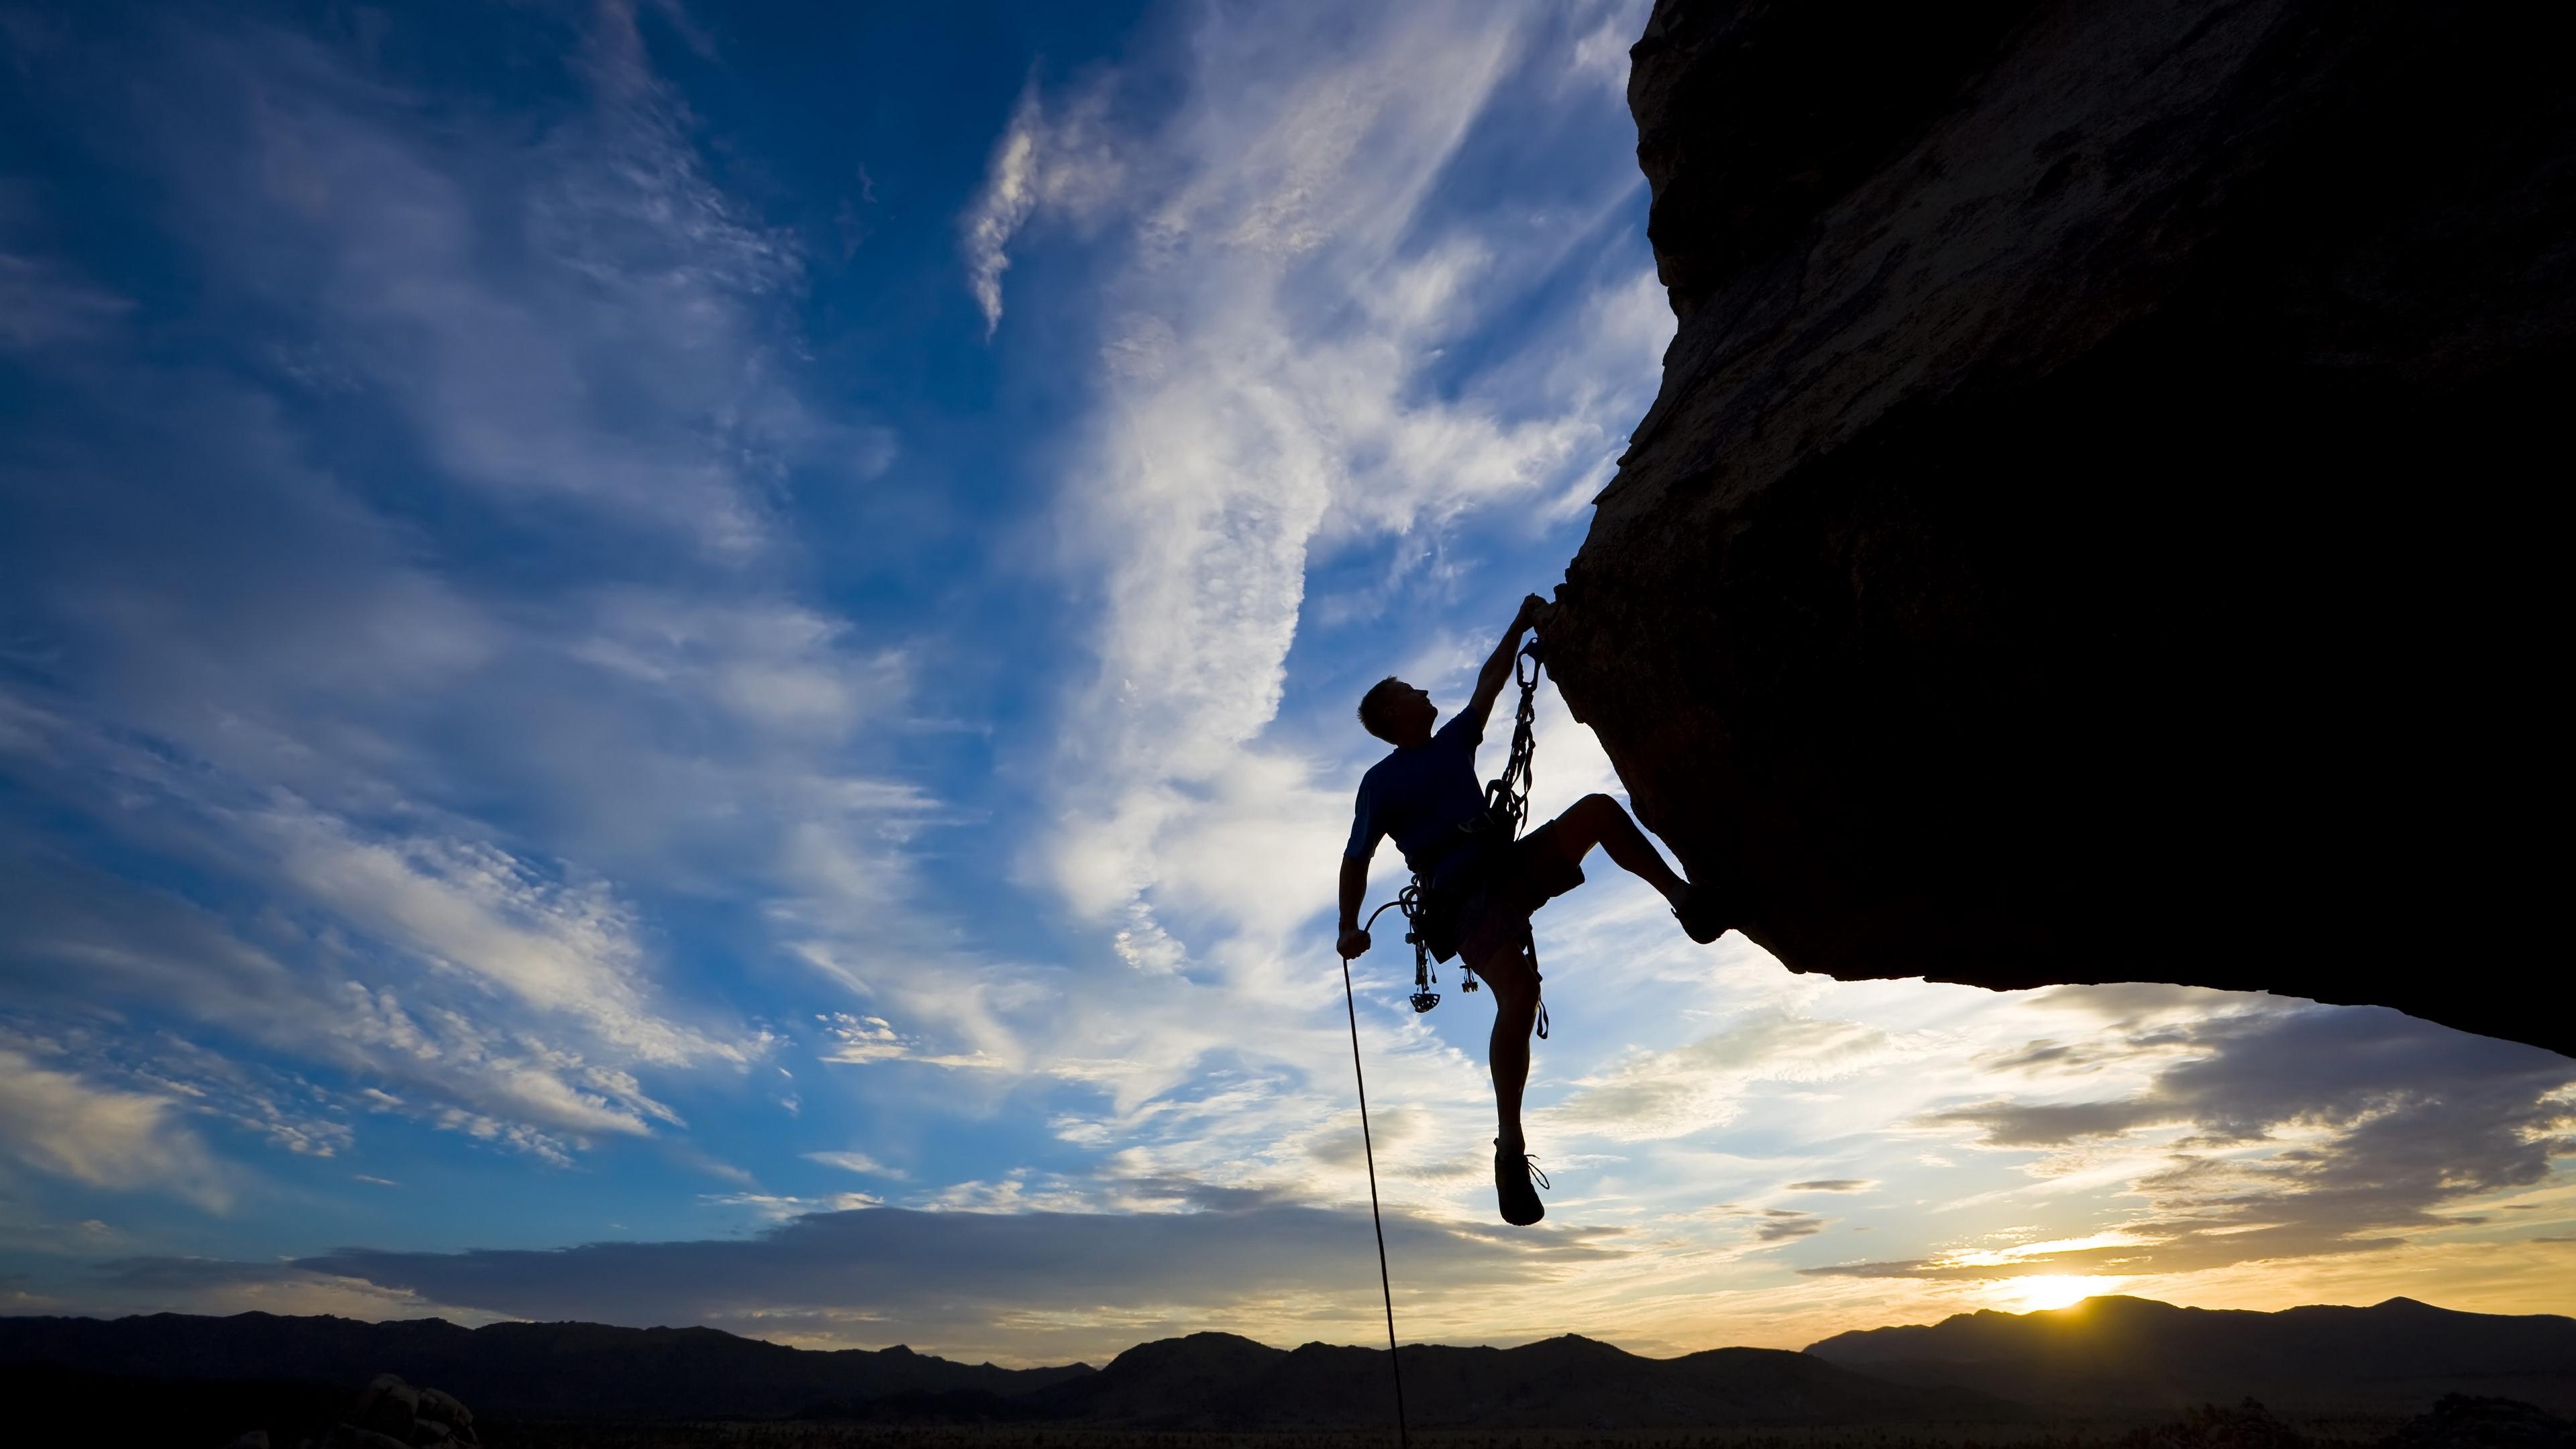 climber extreme silhouette climbing rock difficulties sunset 4k 1540063485 - climber, extreme, silhouette, climbing, rock, difficulties sunset 4k - Silhouette, extreme, climber